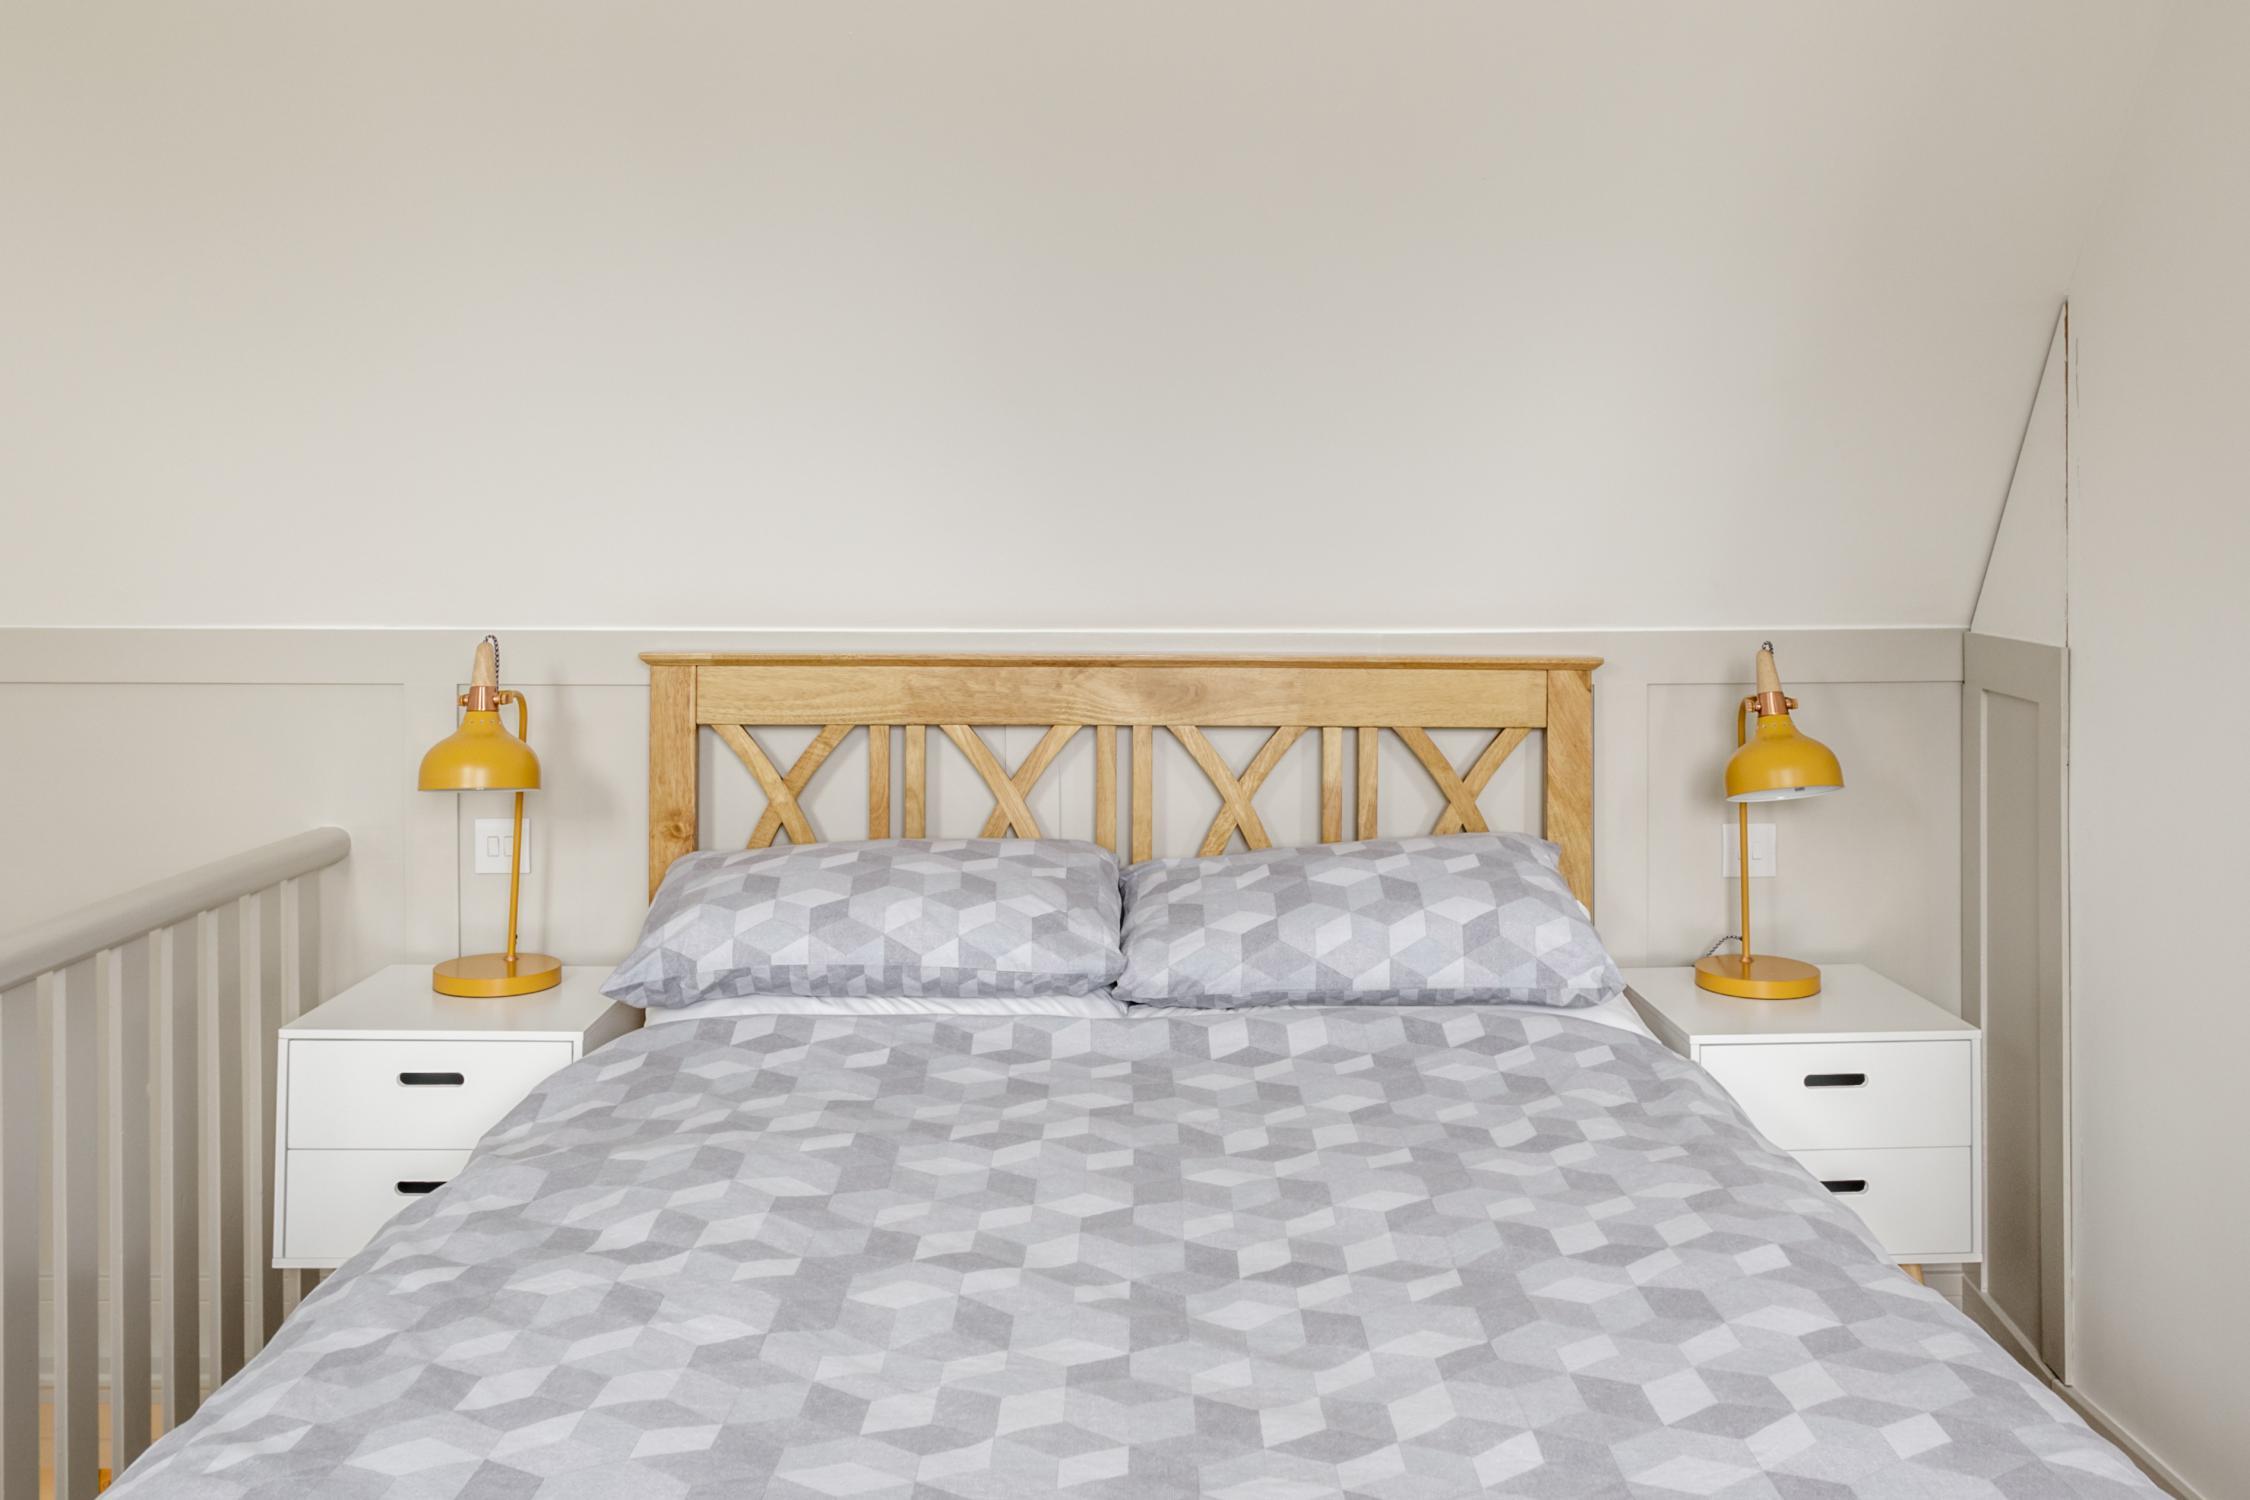 Worthing Builders-ExtraOrdinaryRooms-Arundel renovation Bedroom in the loft with panelling.jpg